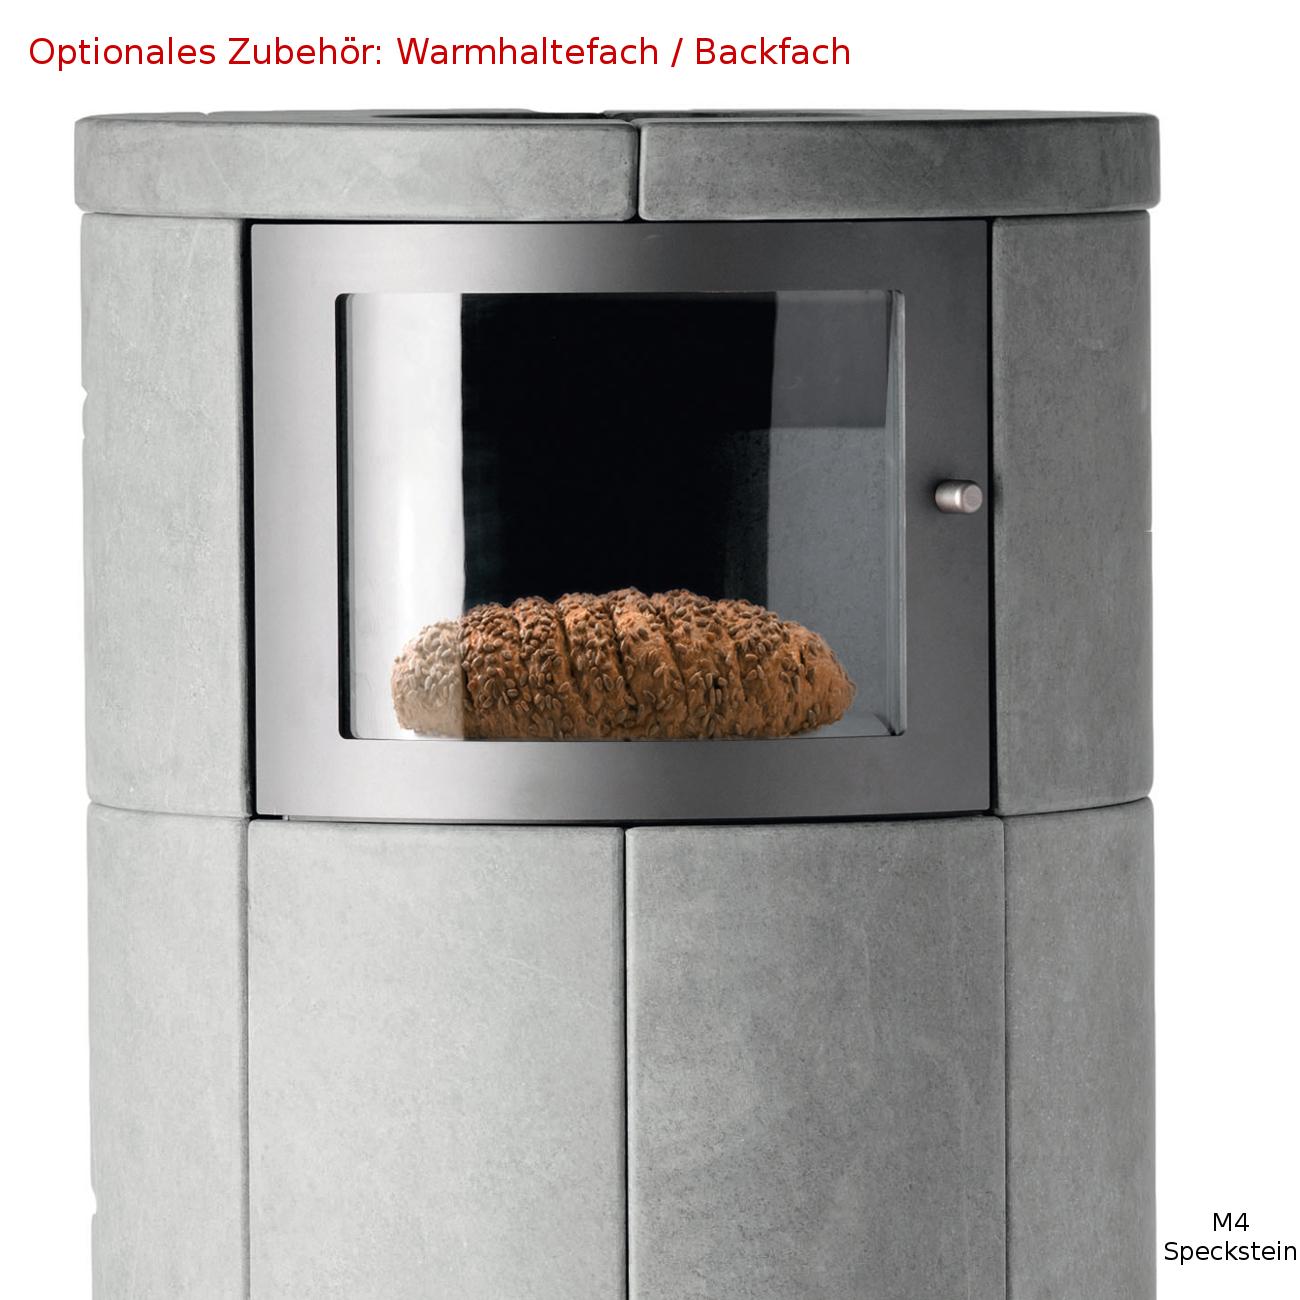 m4-warmhaltefachcRw8yA0ZGXFli